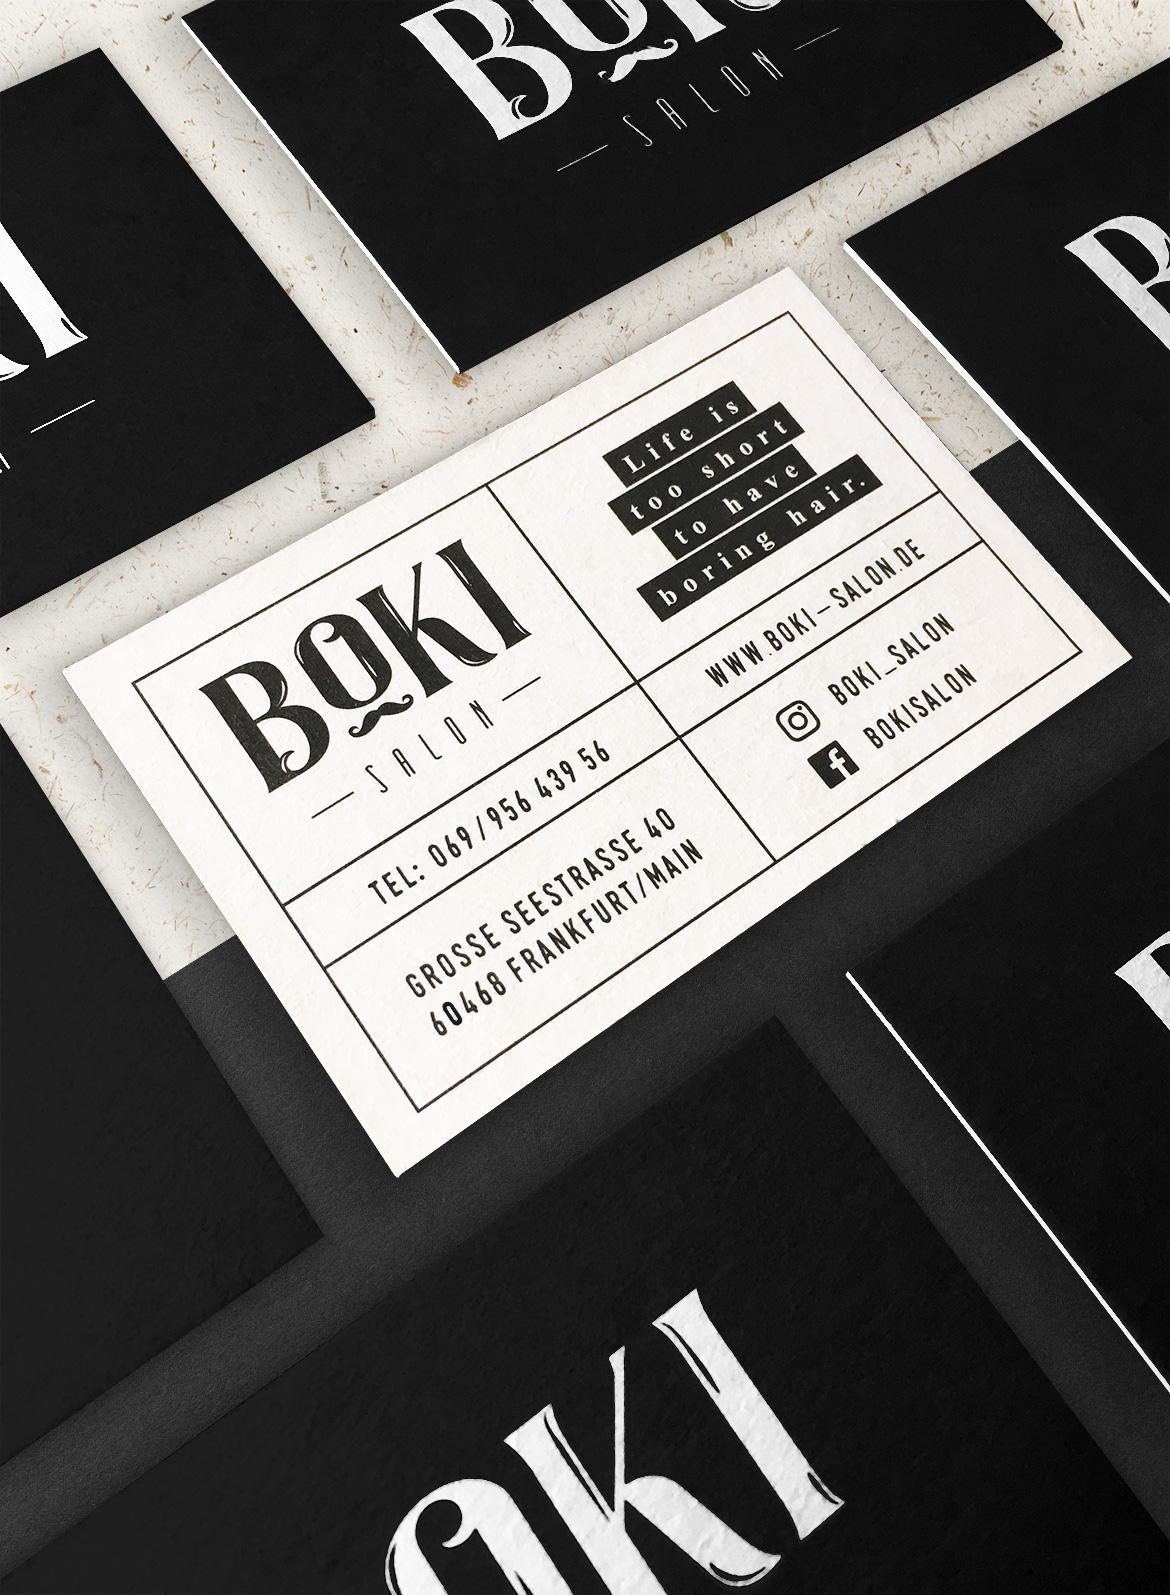 BOKI_VK_01_klein